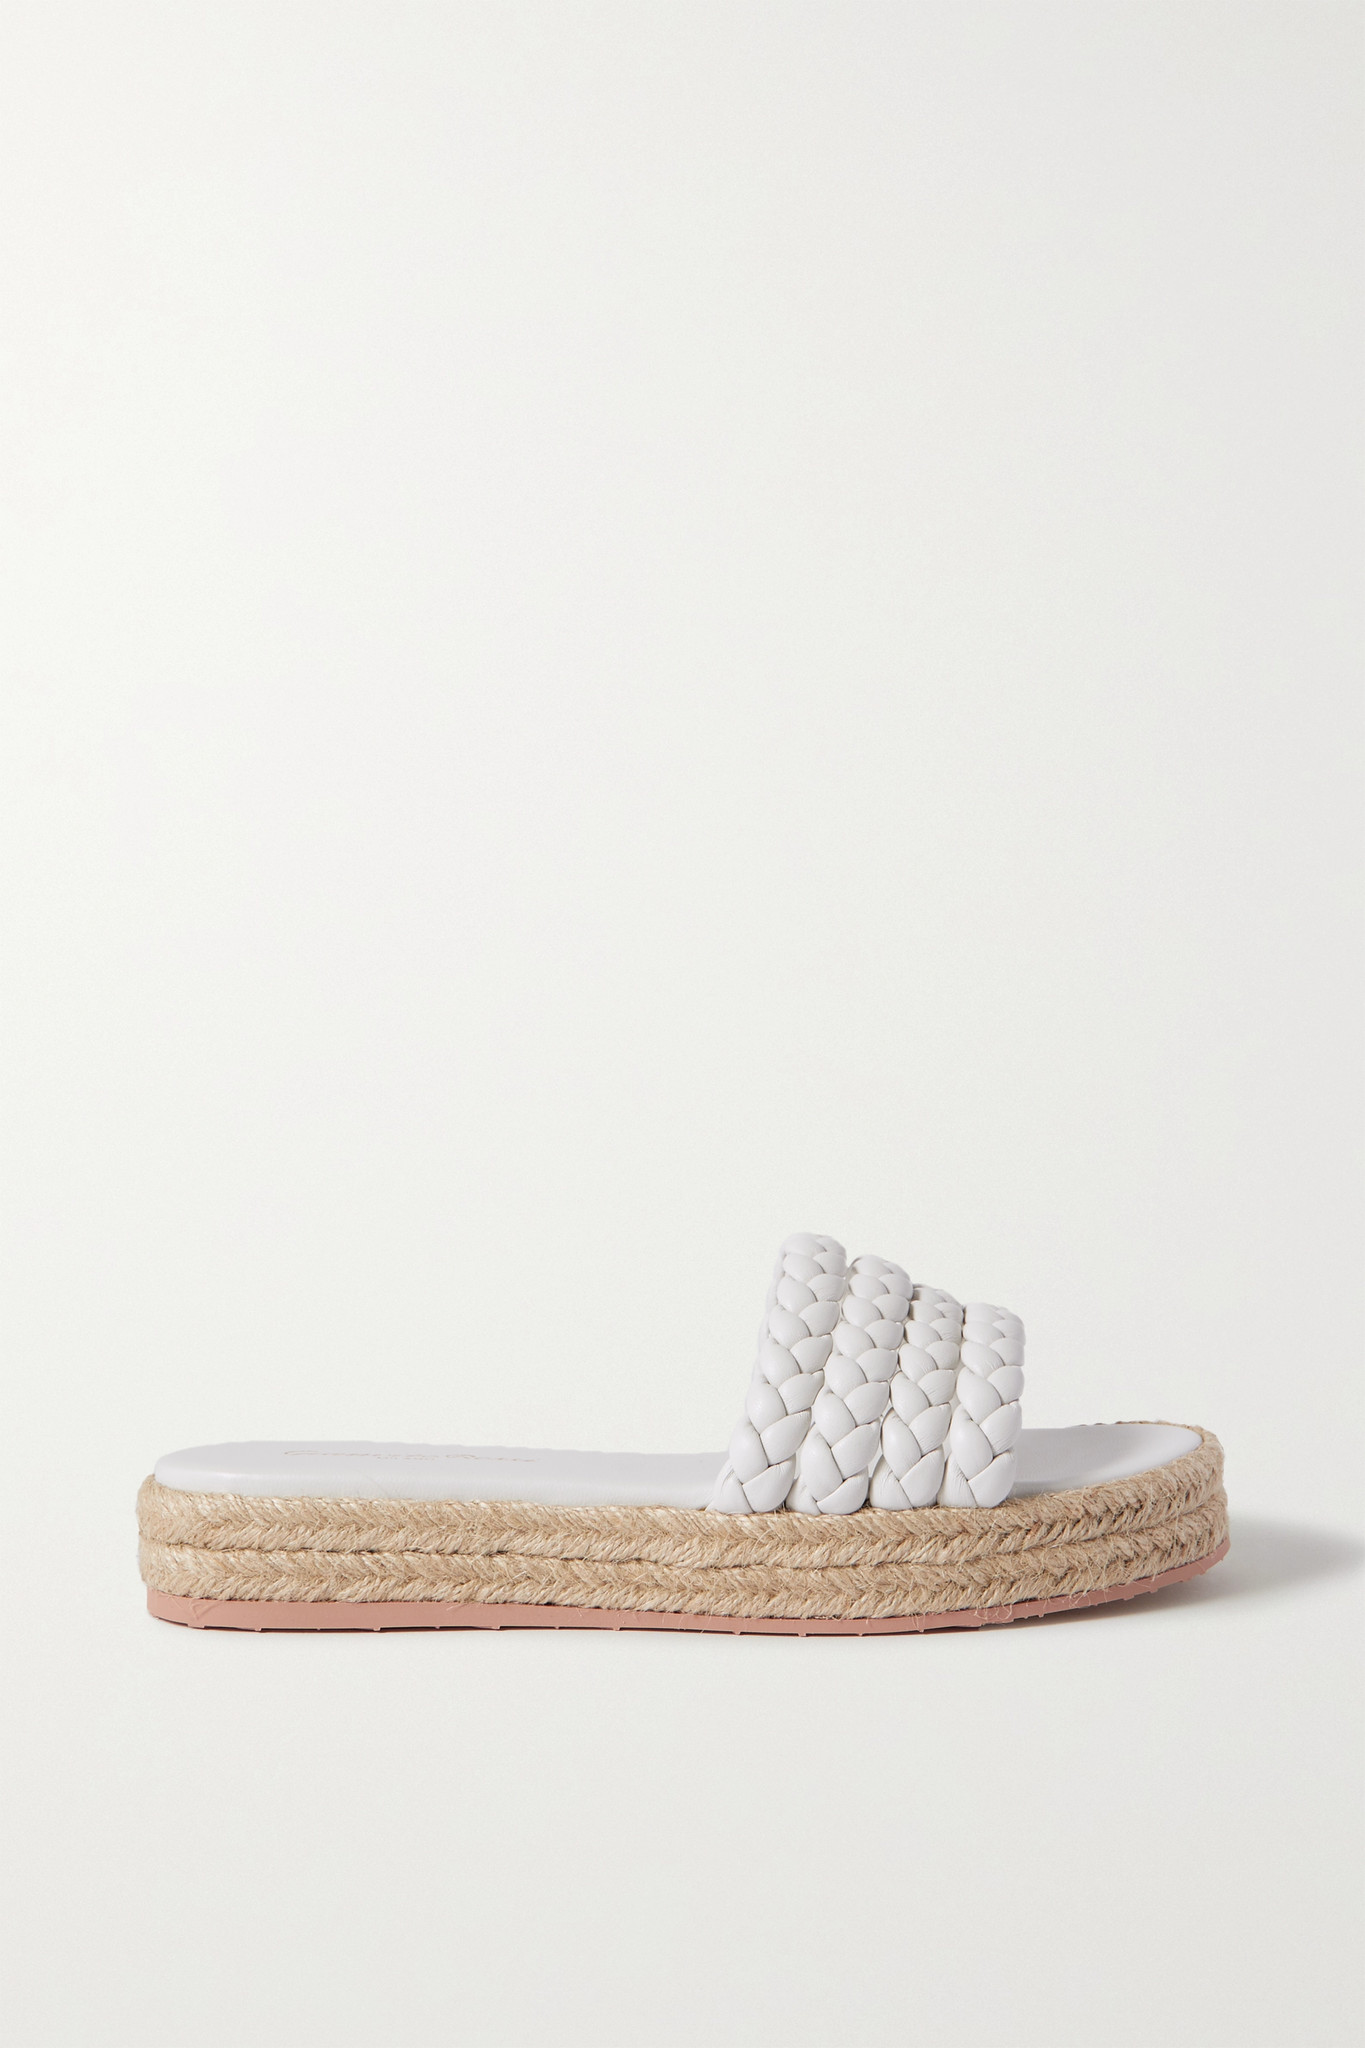 GIANVITO ROSSI - Marbella Braided Leather Espadrille Slides - White - IT41